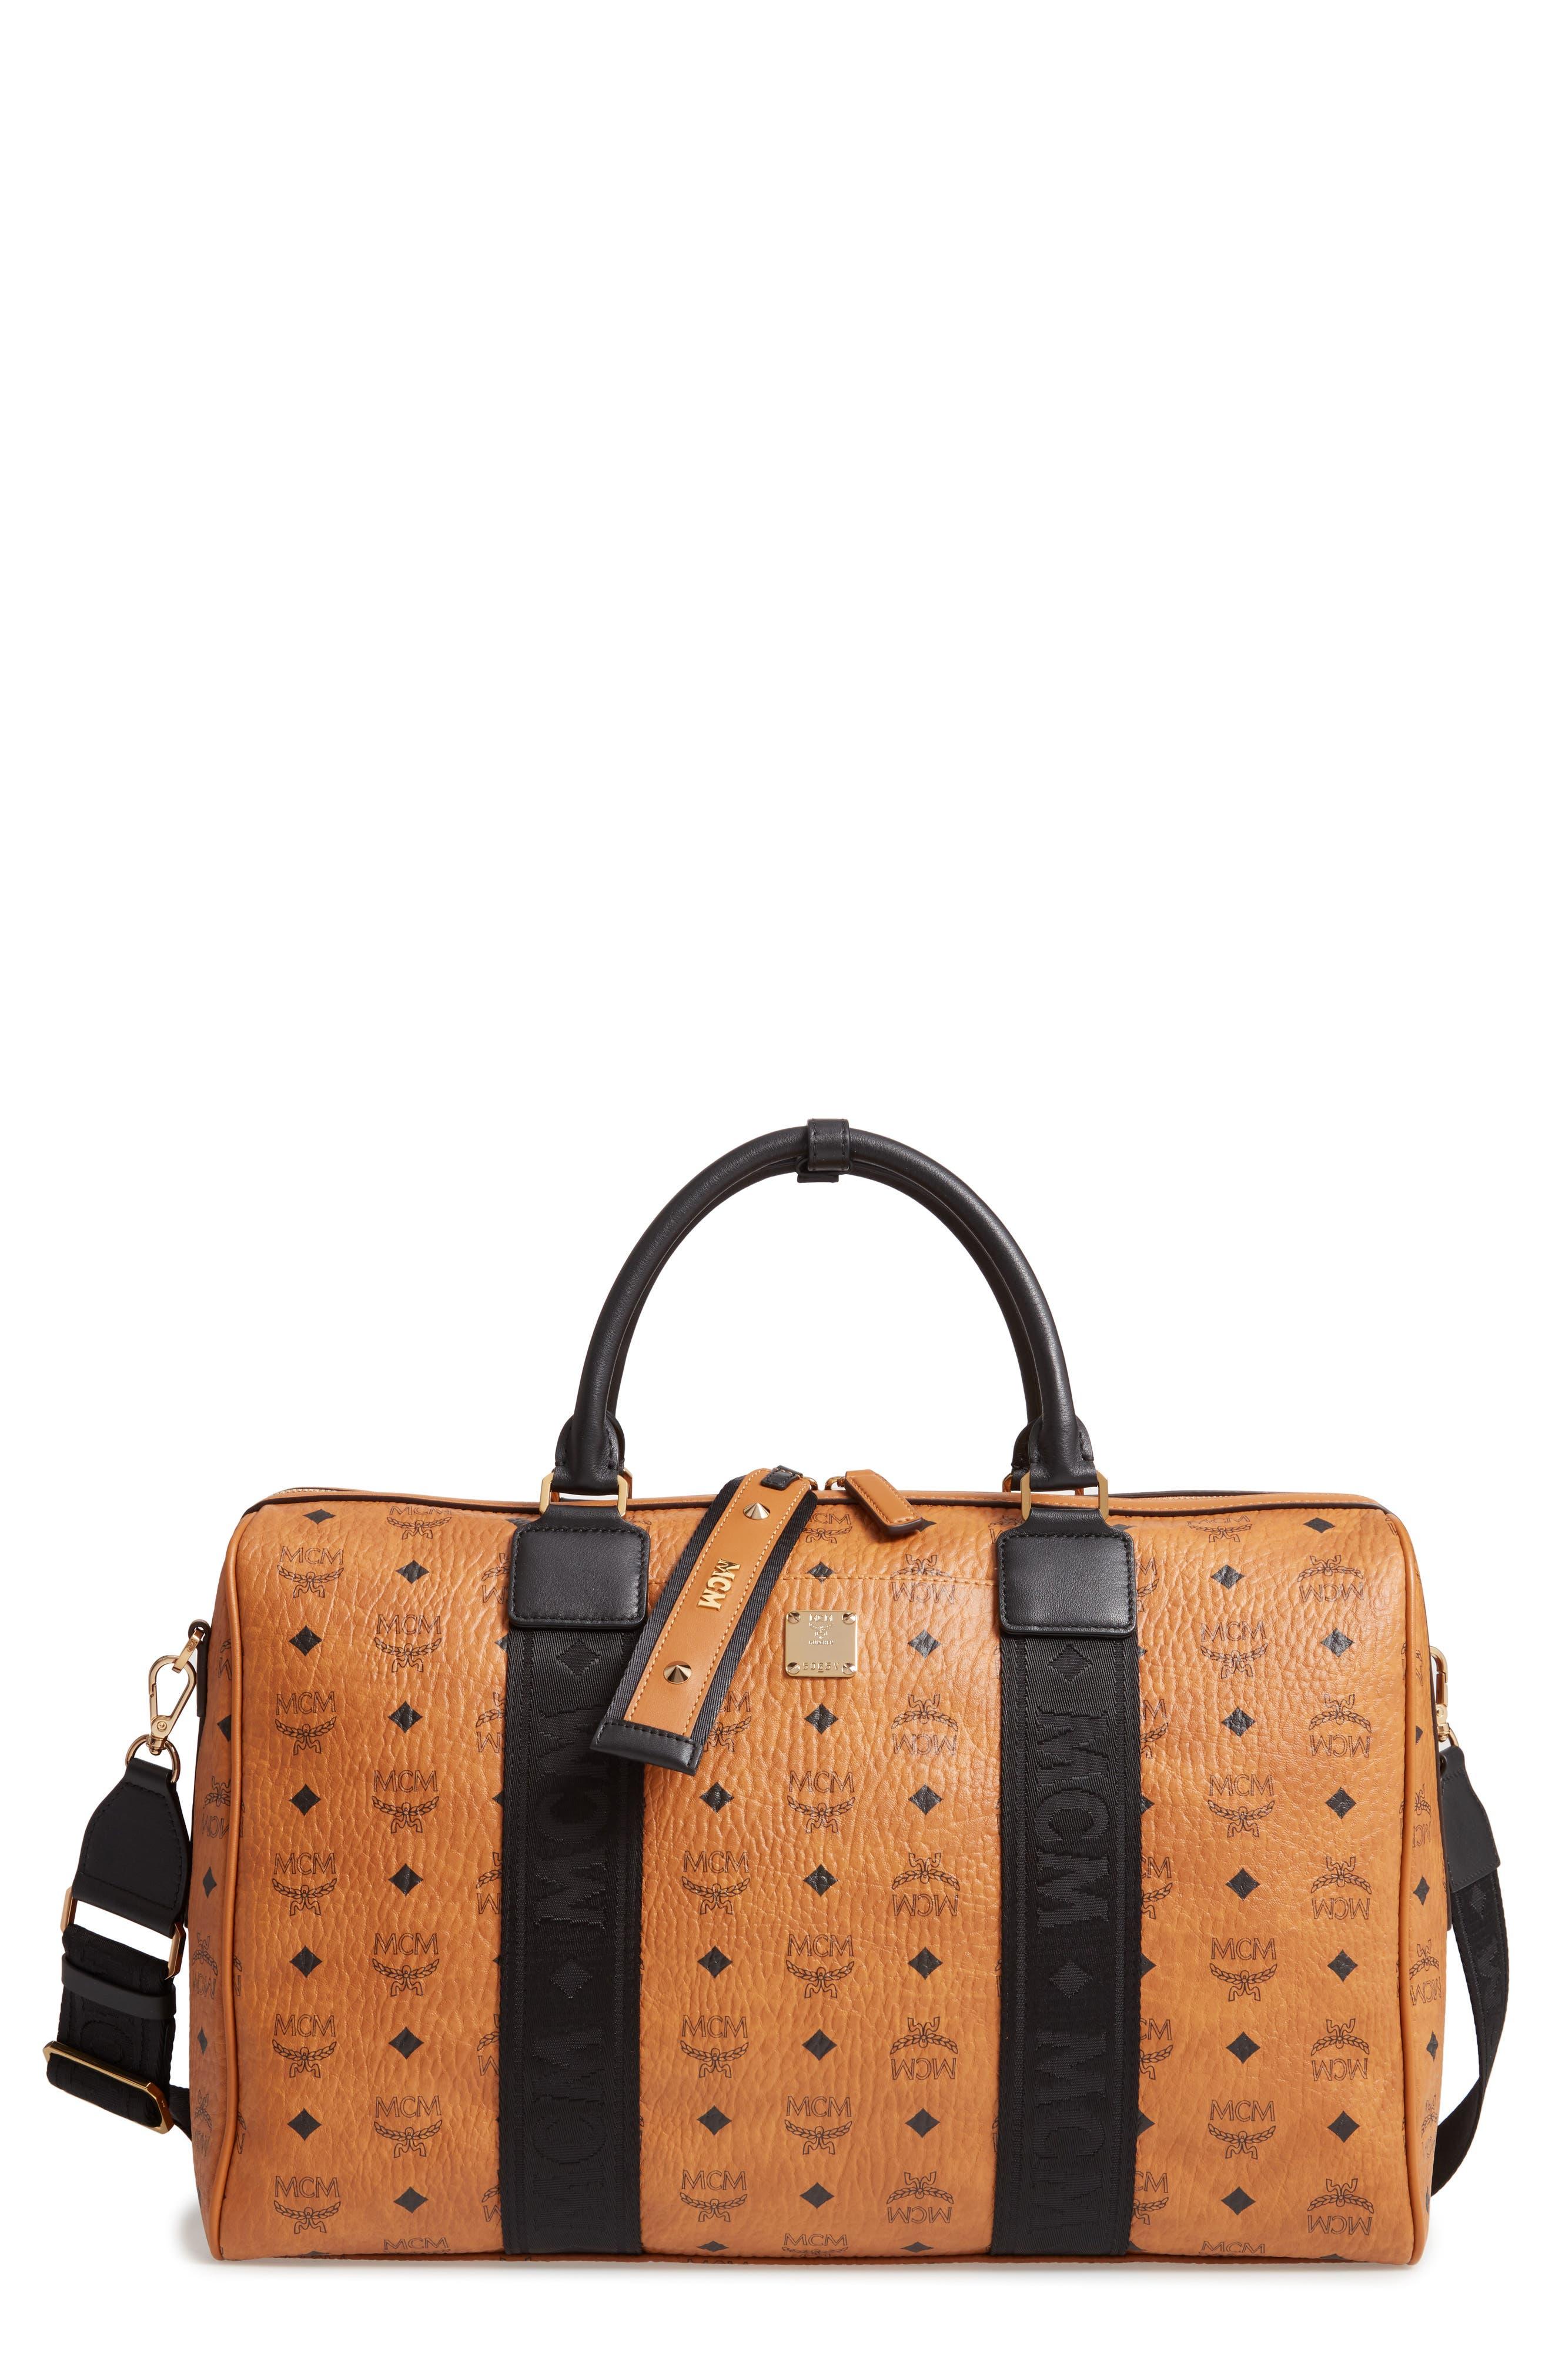 MCM, Traveler Visetos Duffle Bag, Main thumbnail 1, color, COGNAC